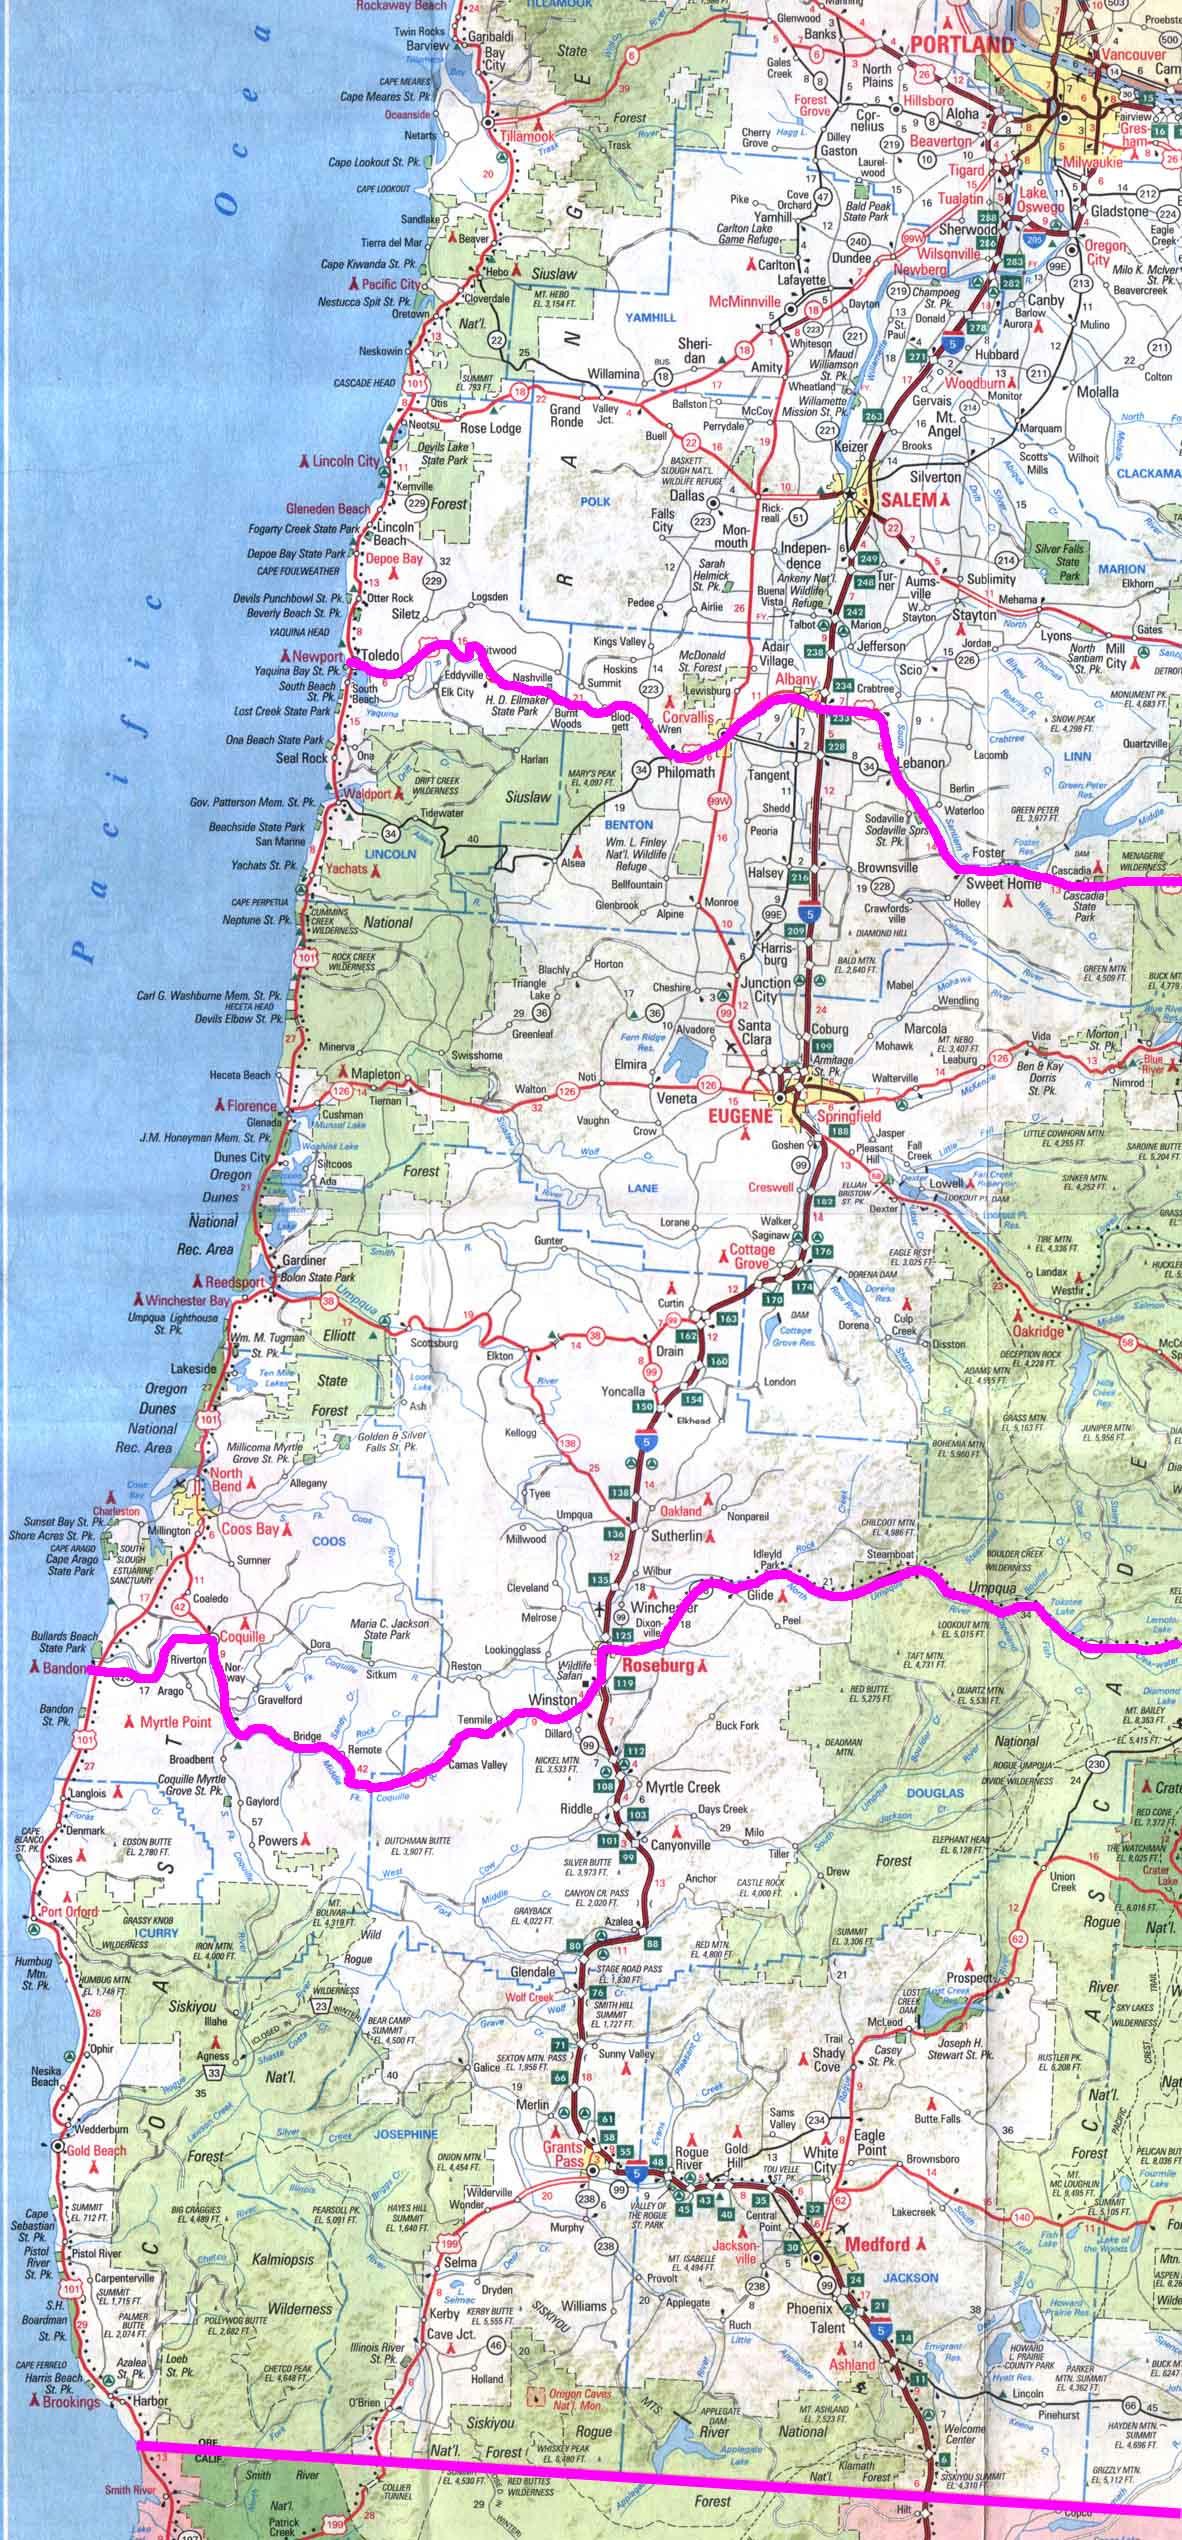 Map Of Oregon California Coast Detailed Map California California - Map Of Oregon And California Coastline